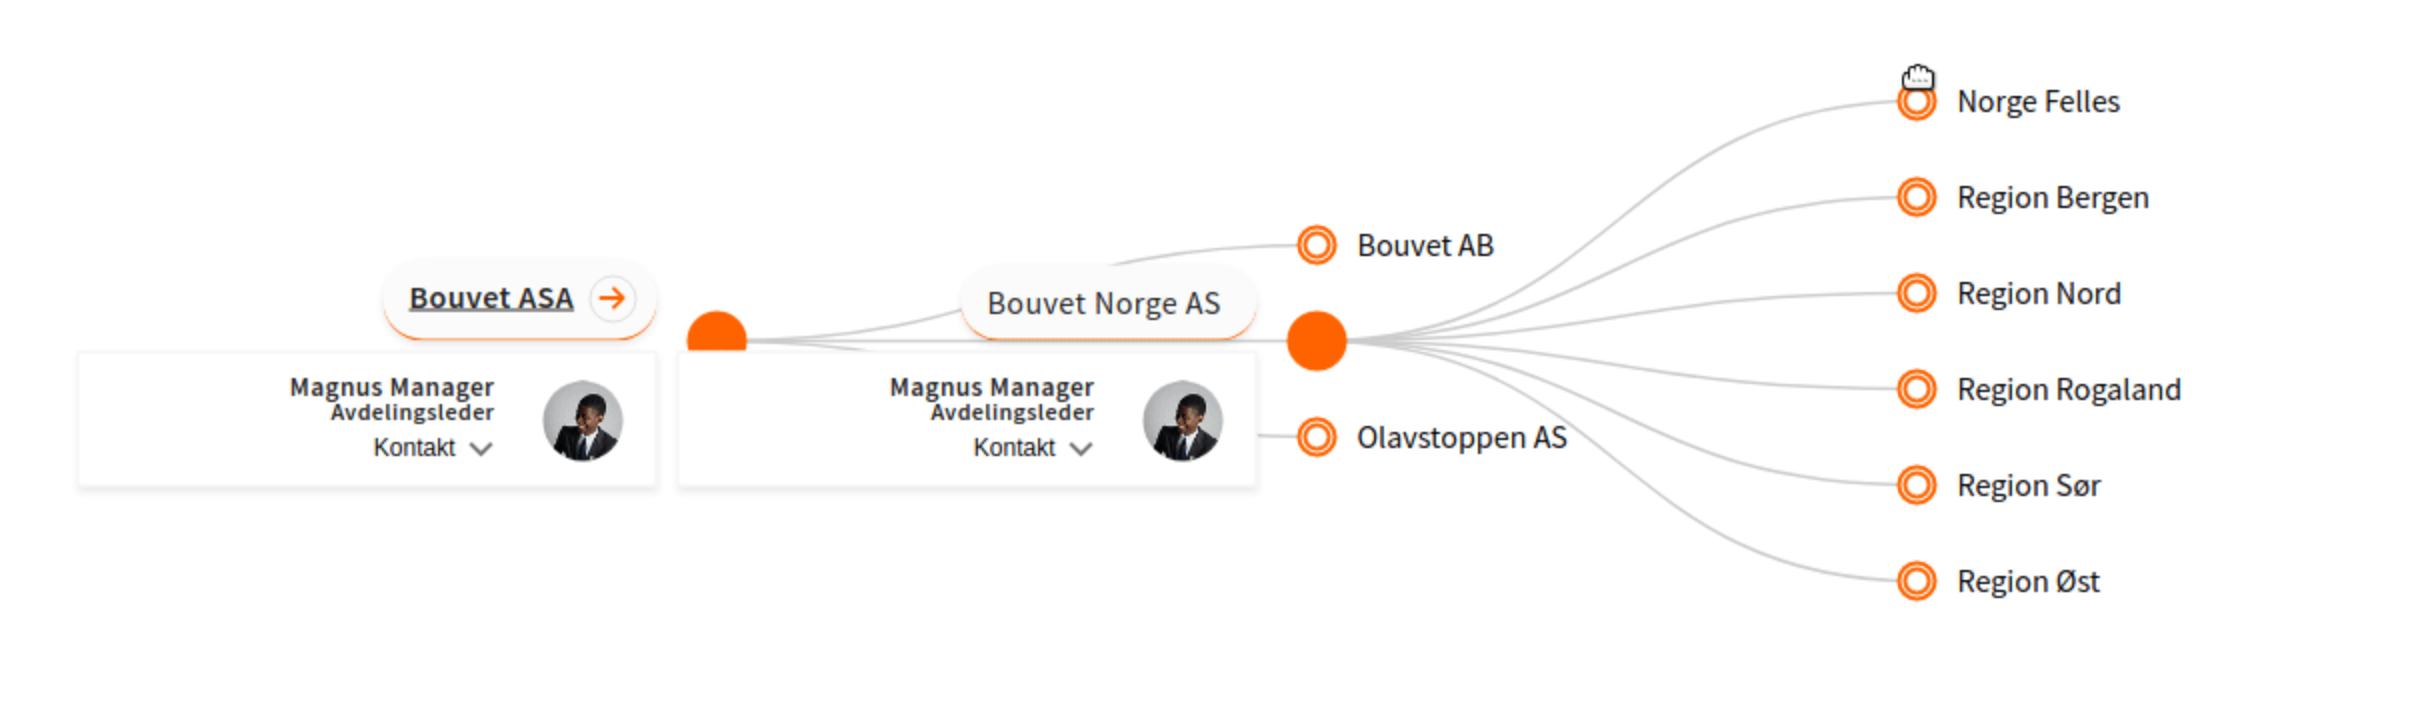 Organization map example